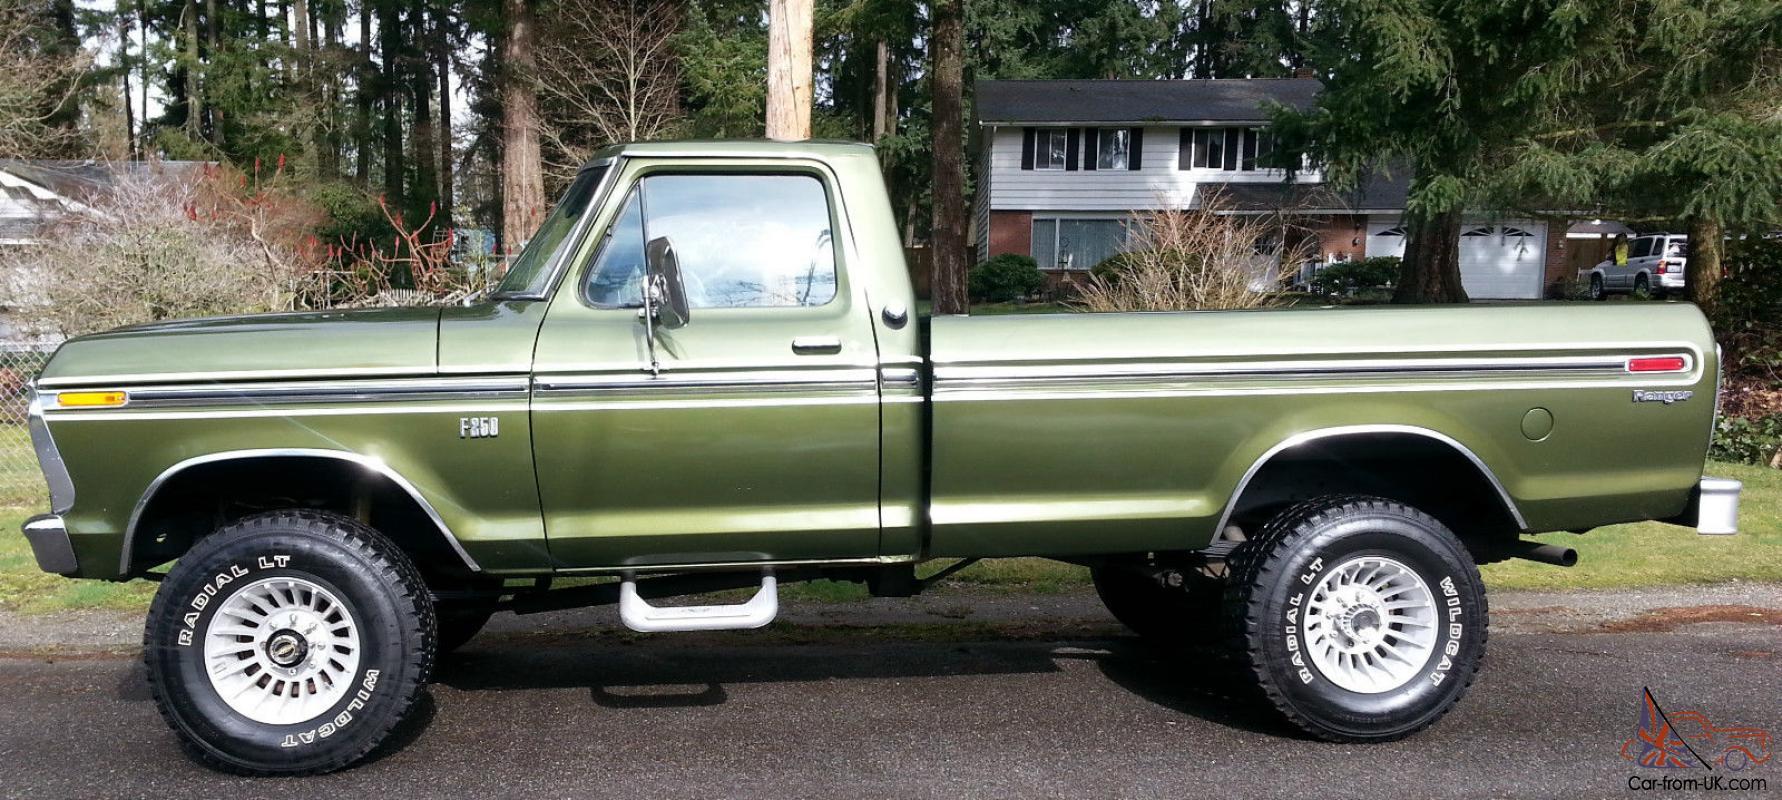 hight resolution of 1975 ford highboy f 250 ranger 4x4 390 auto a c locking hubs buy